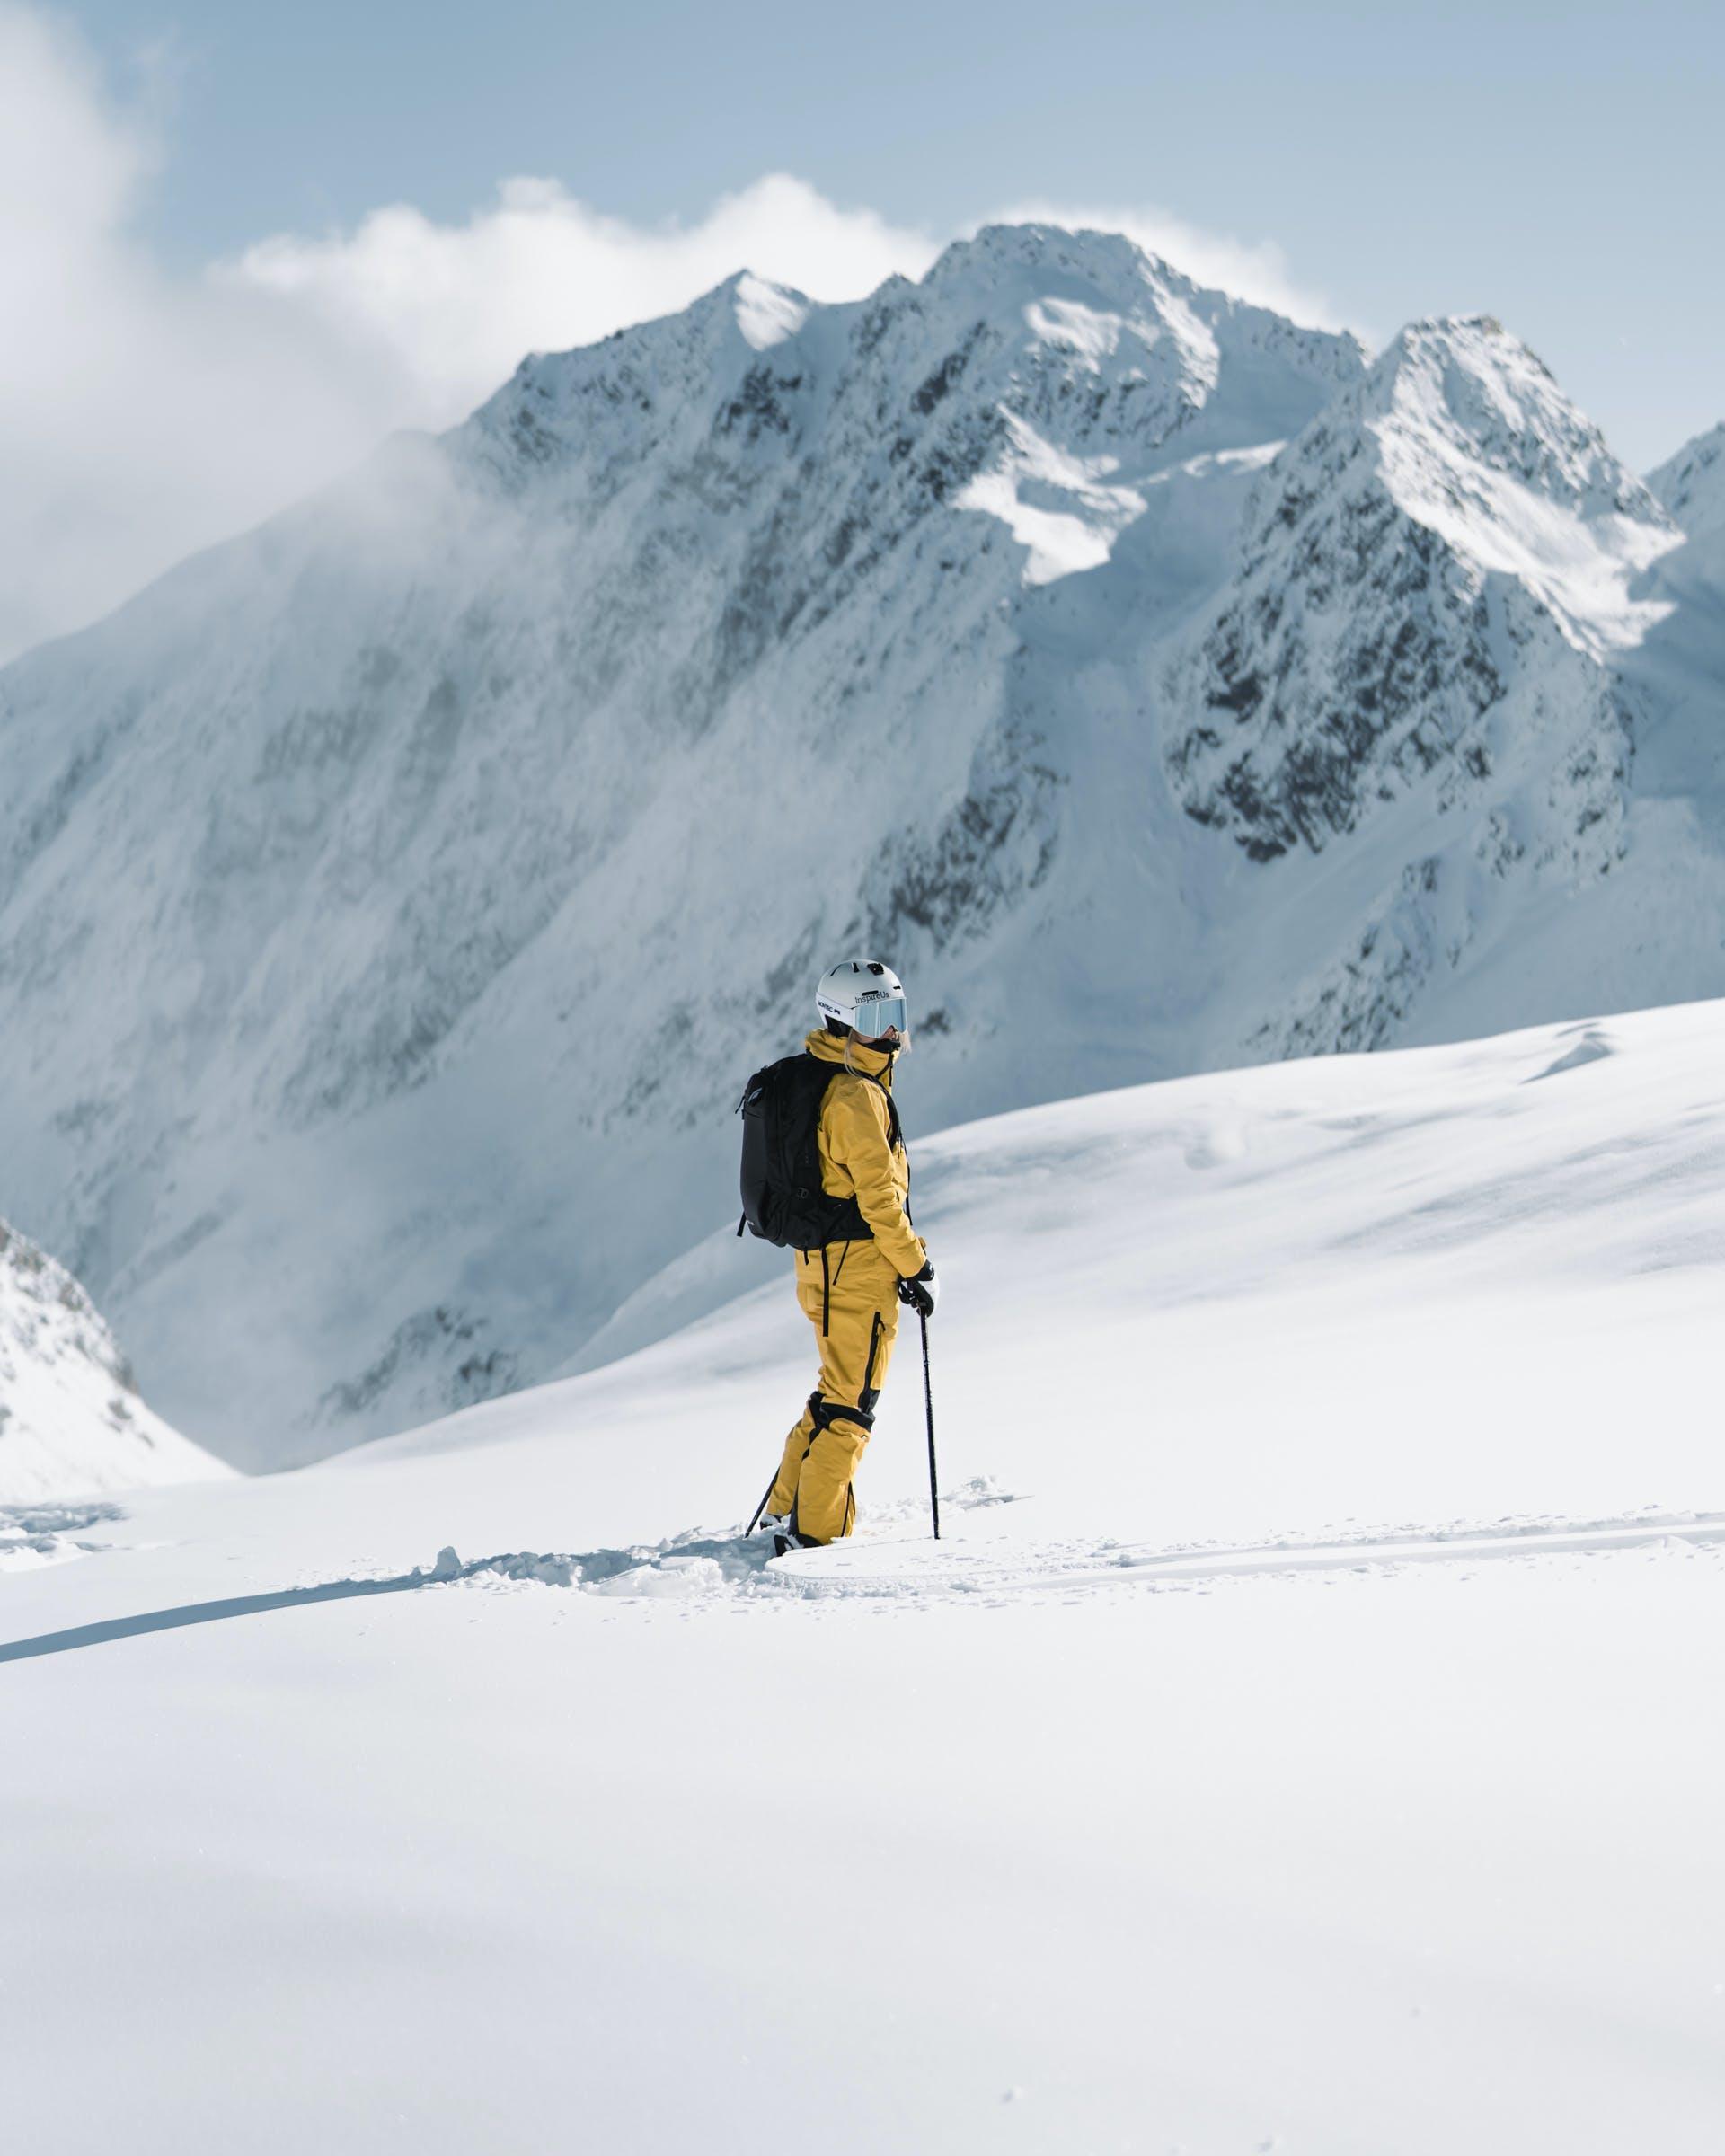 What makes Heli skiing so amazing?